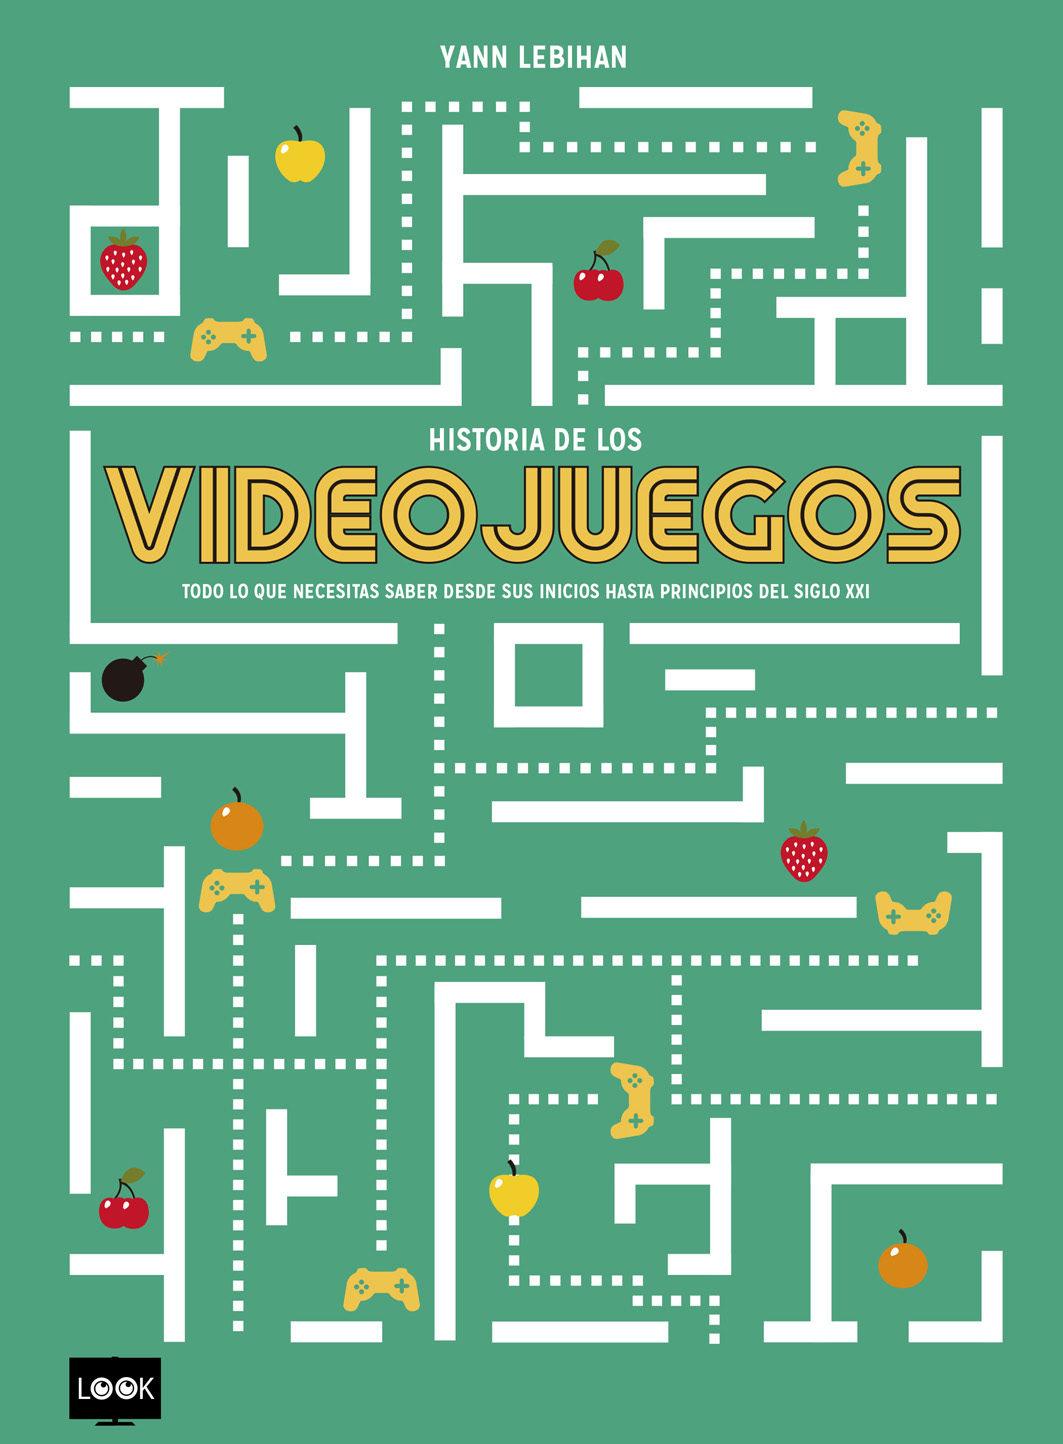 Historia De Los Videojuegos por Yann Lebihan